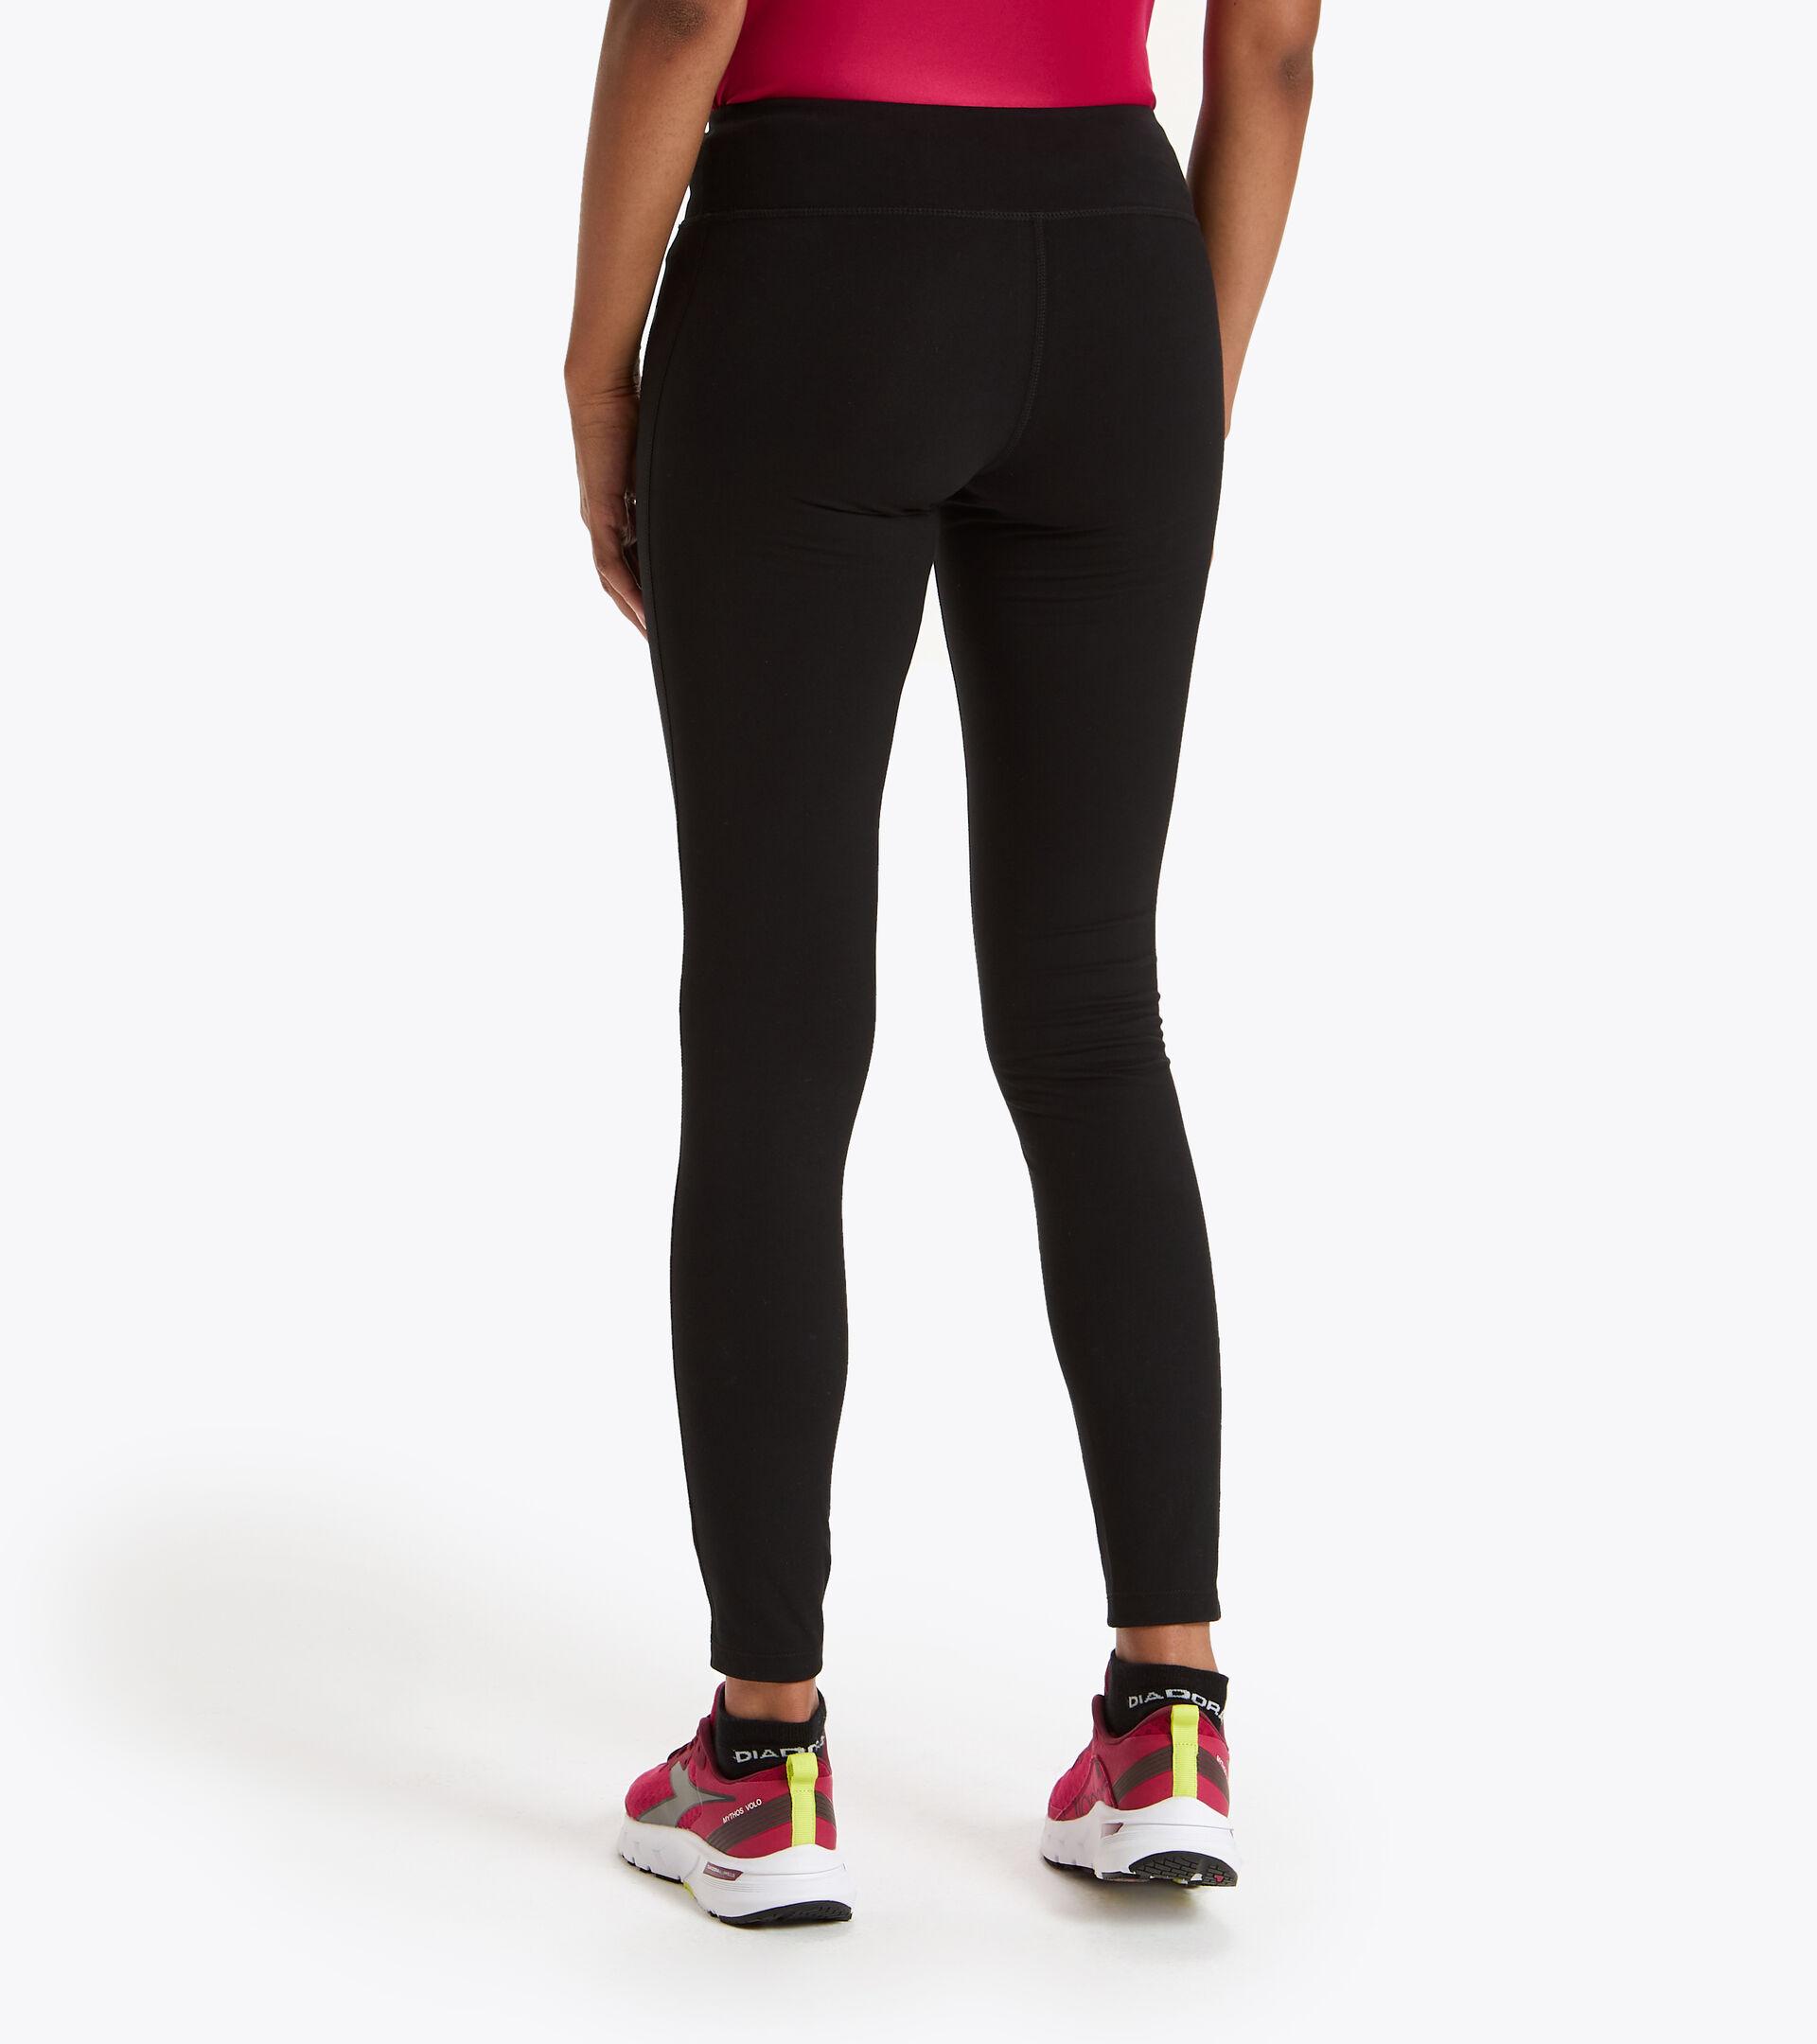 Training leggings - Women L. STC LEGGINGS BE ONE BLACK - Diadora